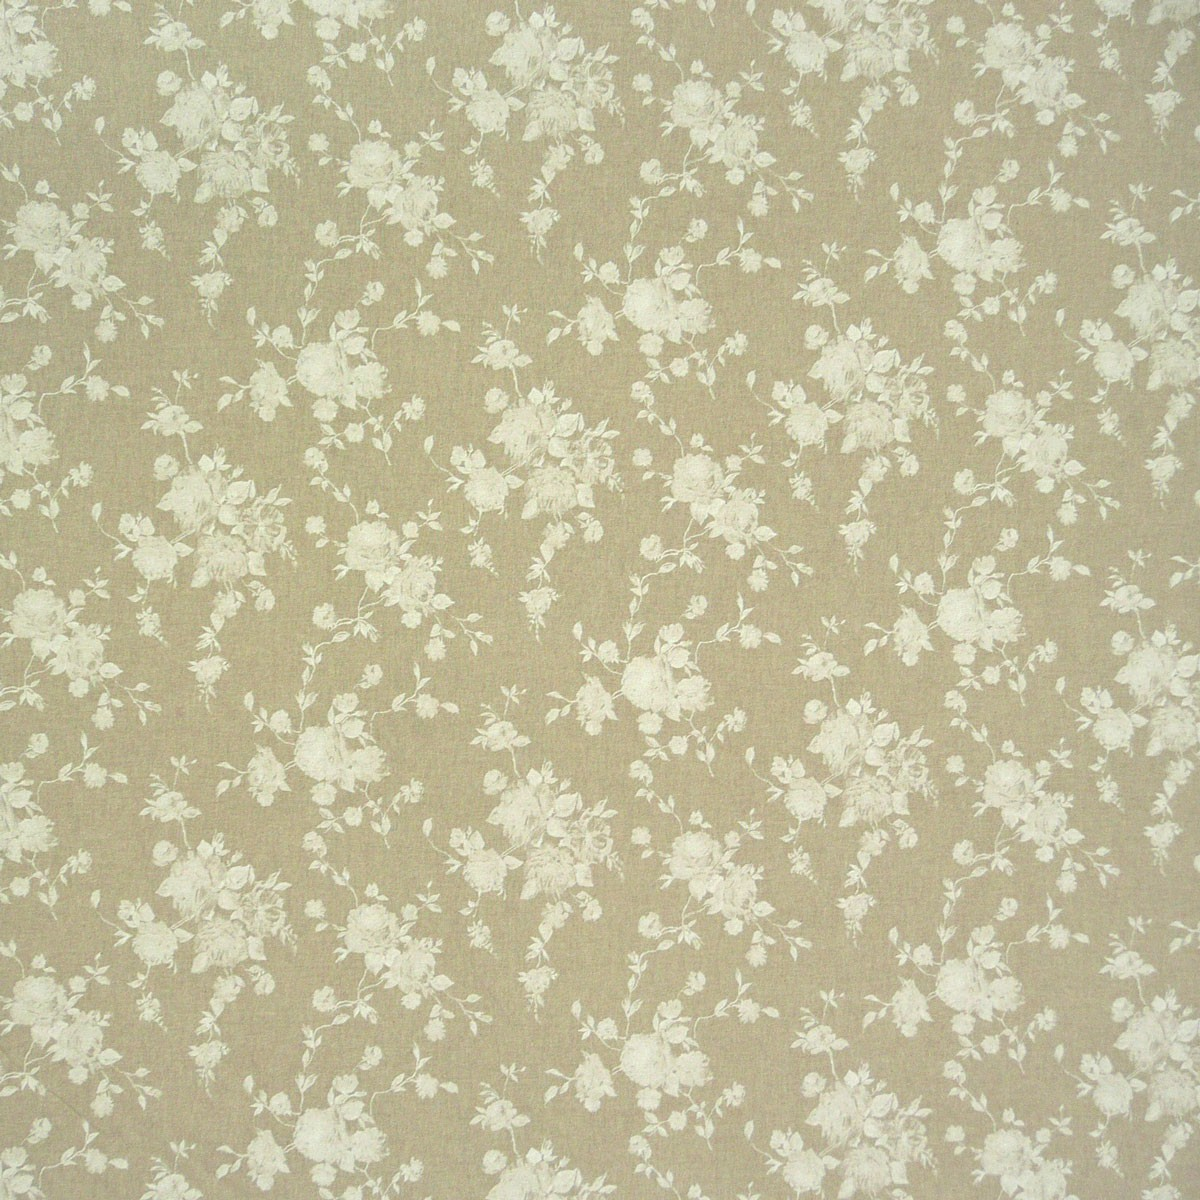 dekostoff rosen natur creme gardinenstoff stoff meterware stoffe stoffe gemustert stoff blumen. Black Bedroom Furniture Sets. Home Design Ideas